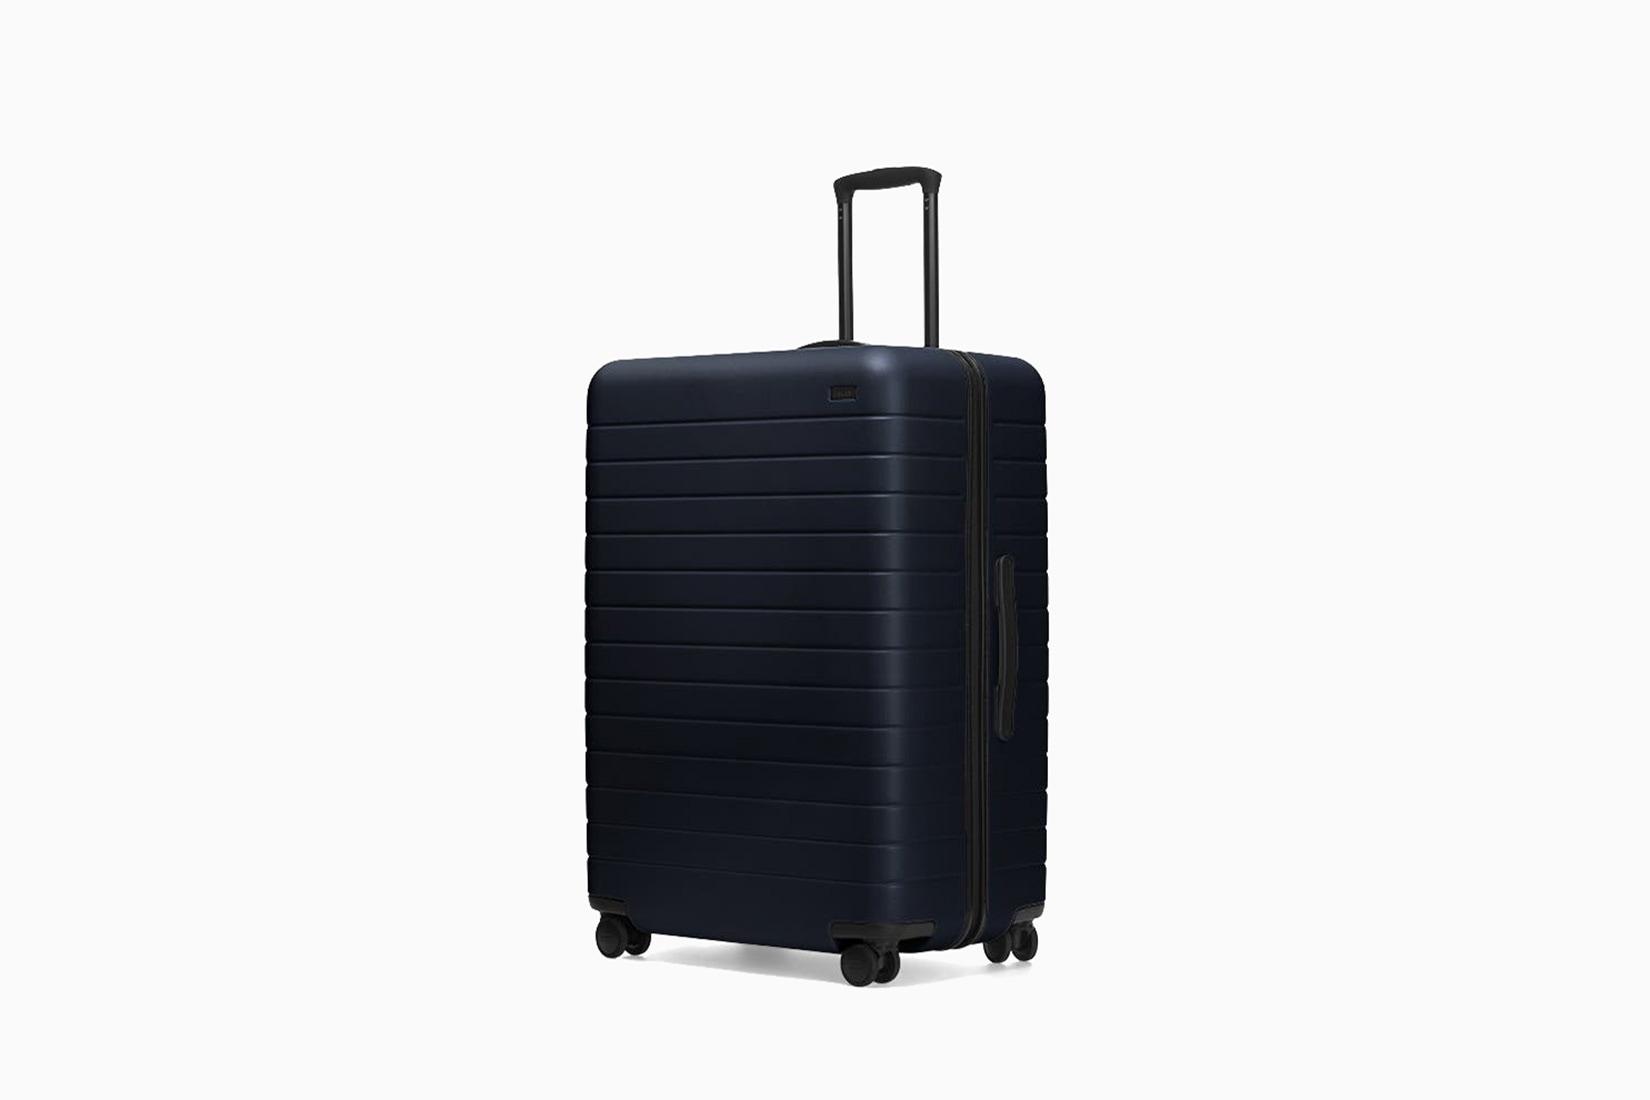 best luggage brands suitcase away - Luxe Digital